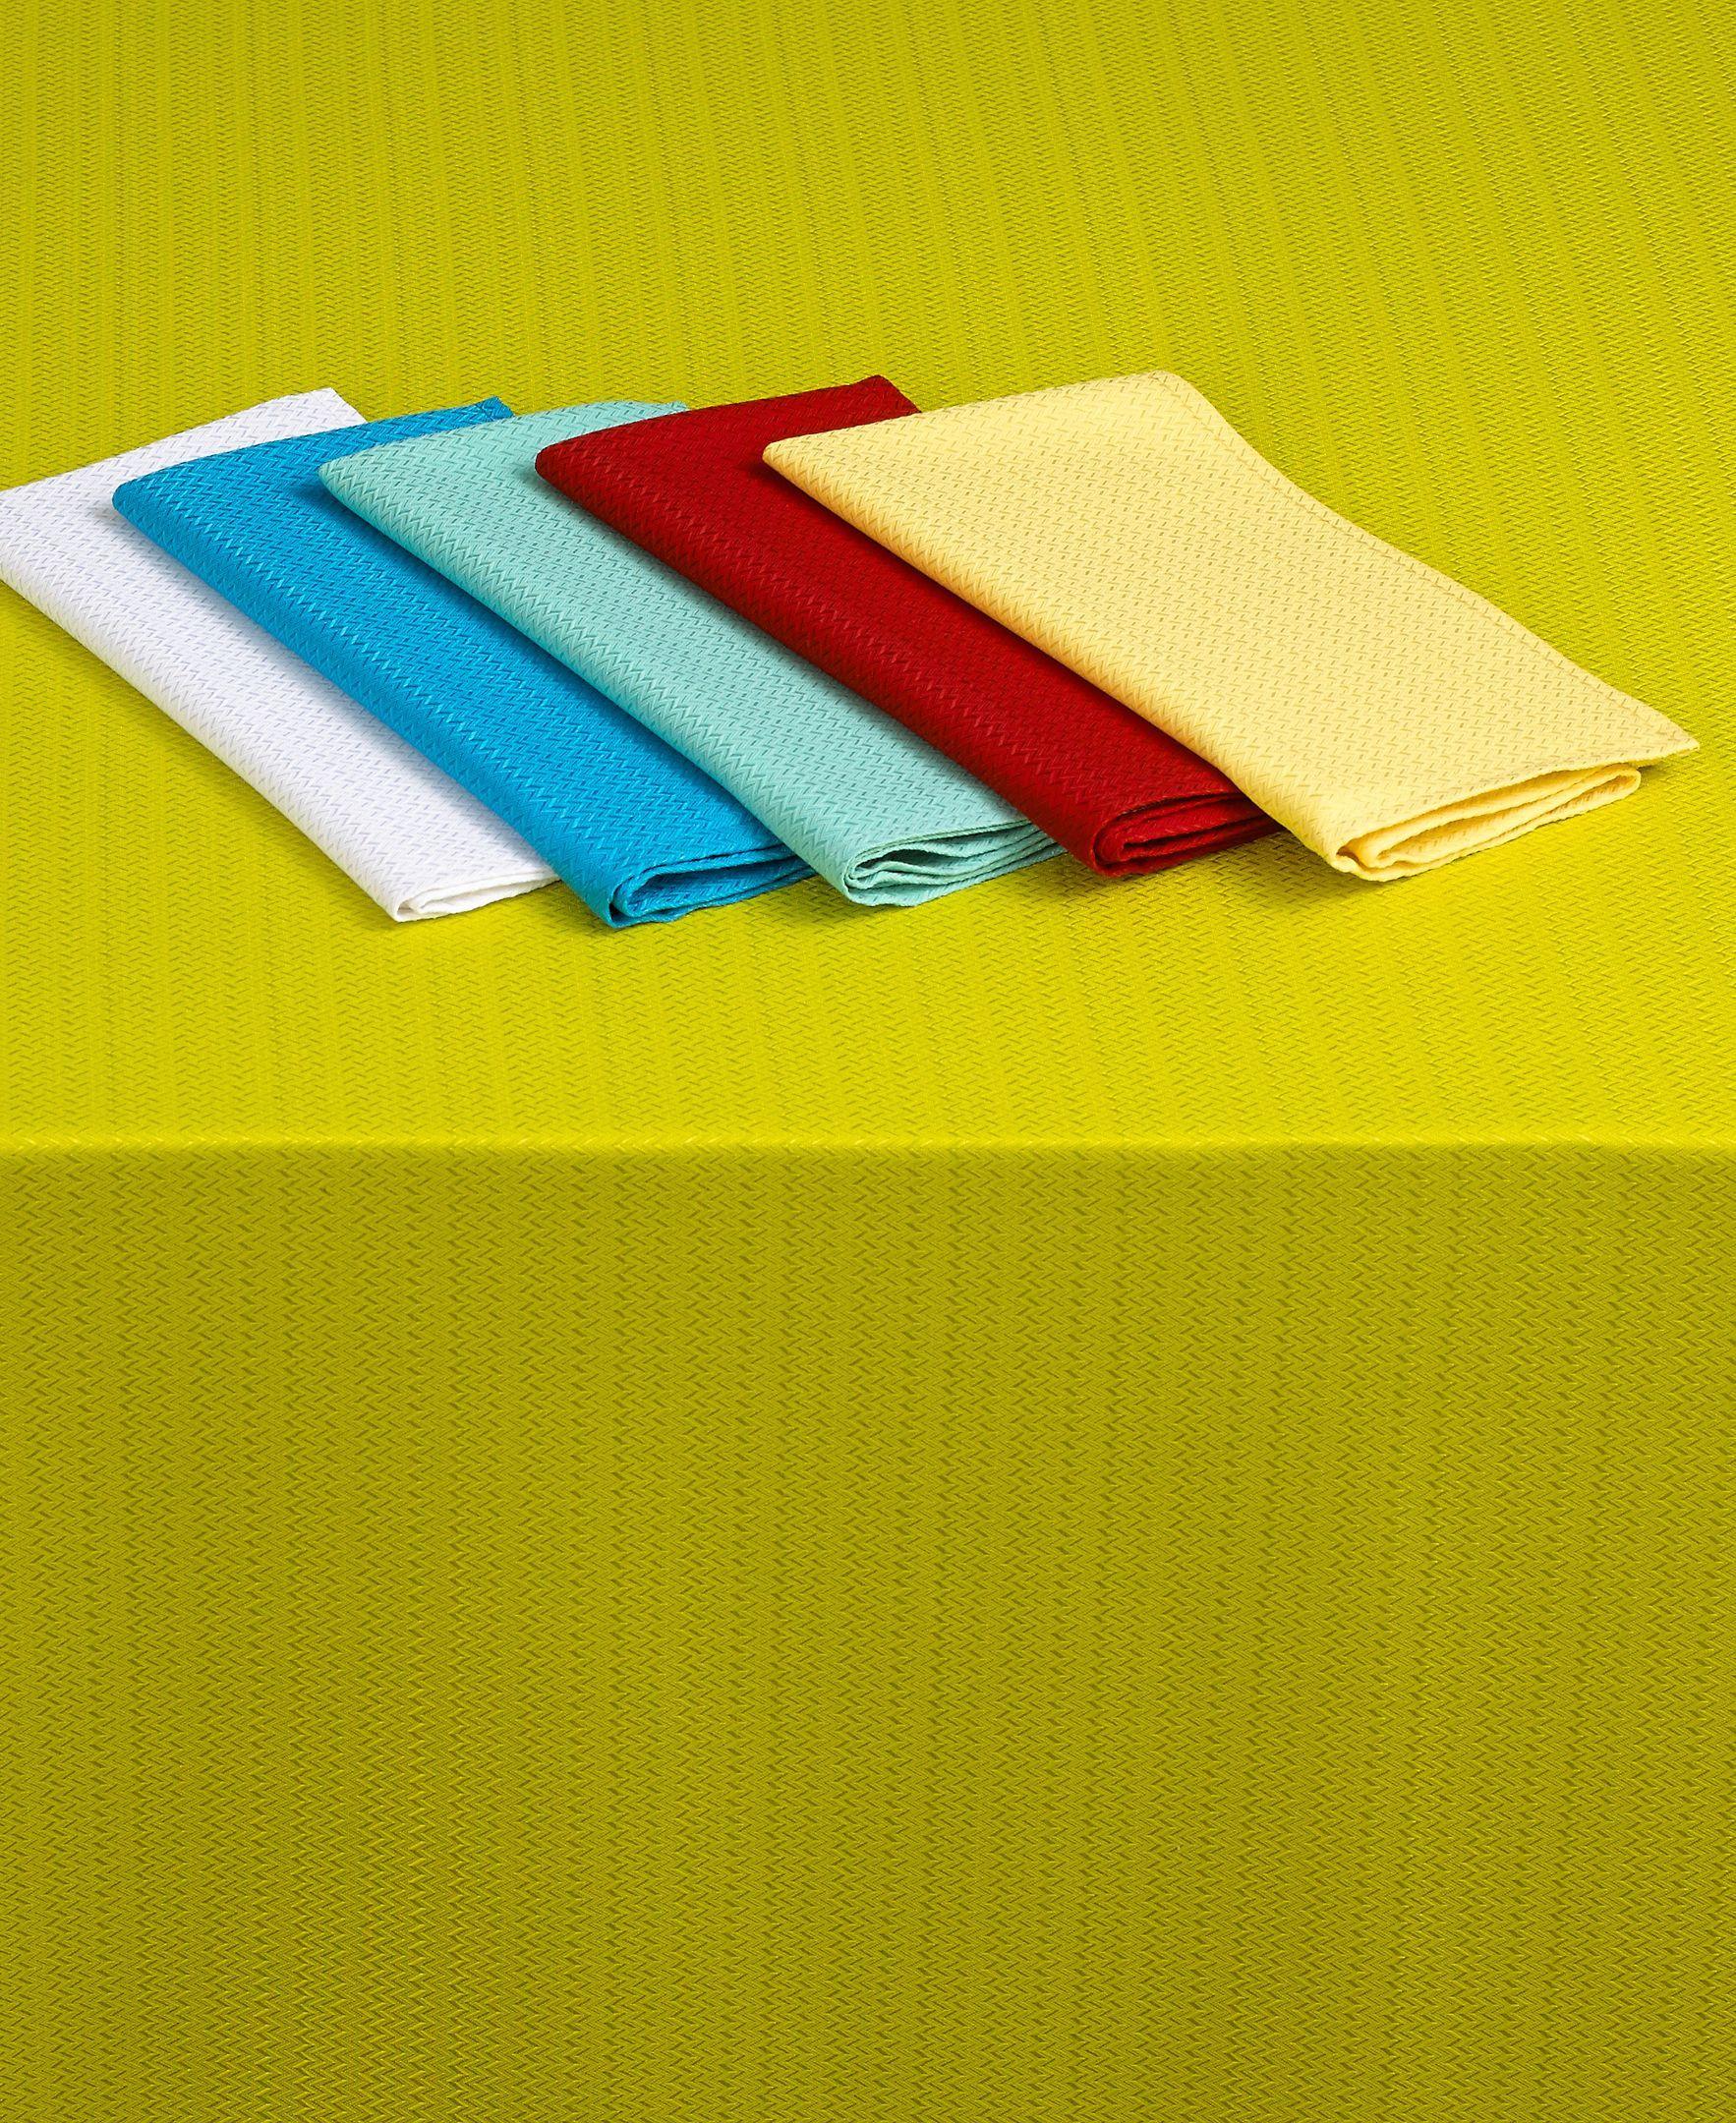 "Fiesta Table Linens, Zig Zag 60"" x 102"" Tablecloth"